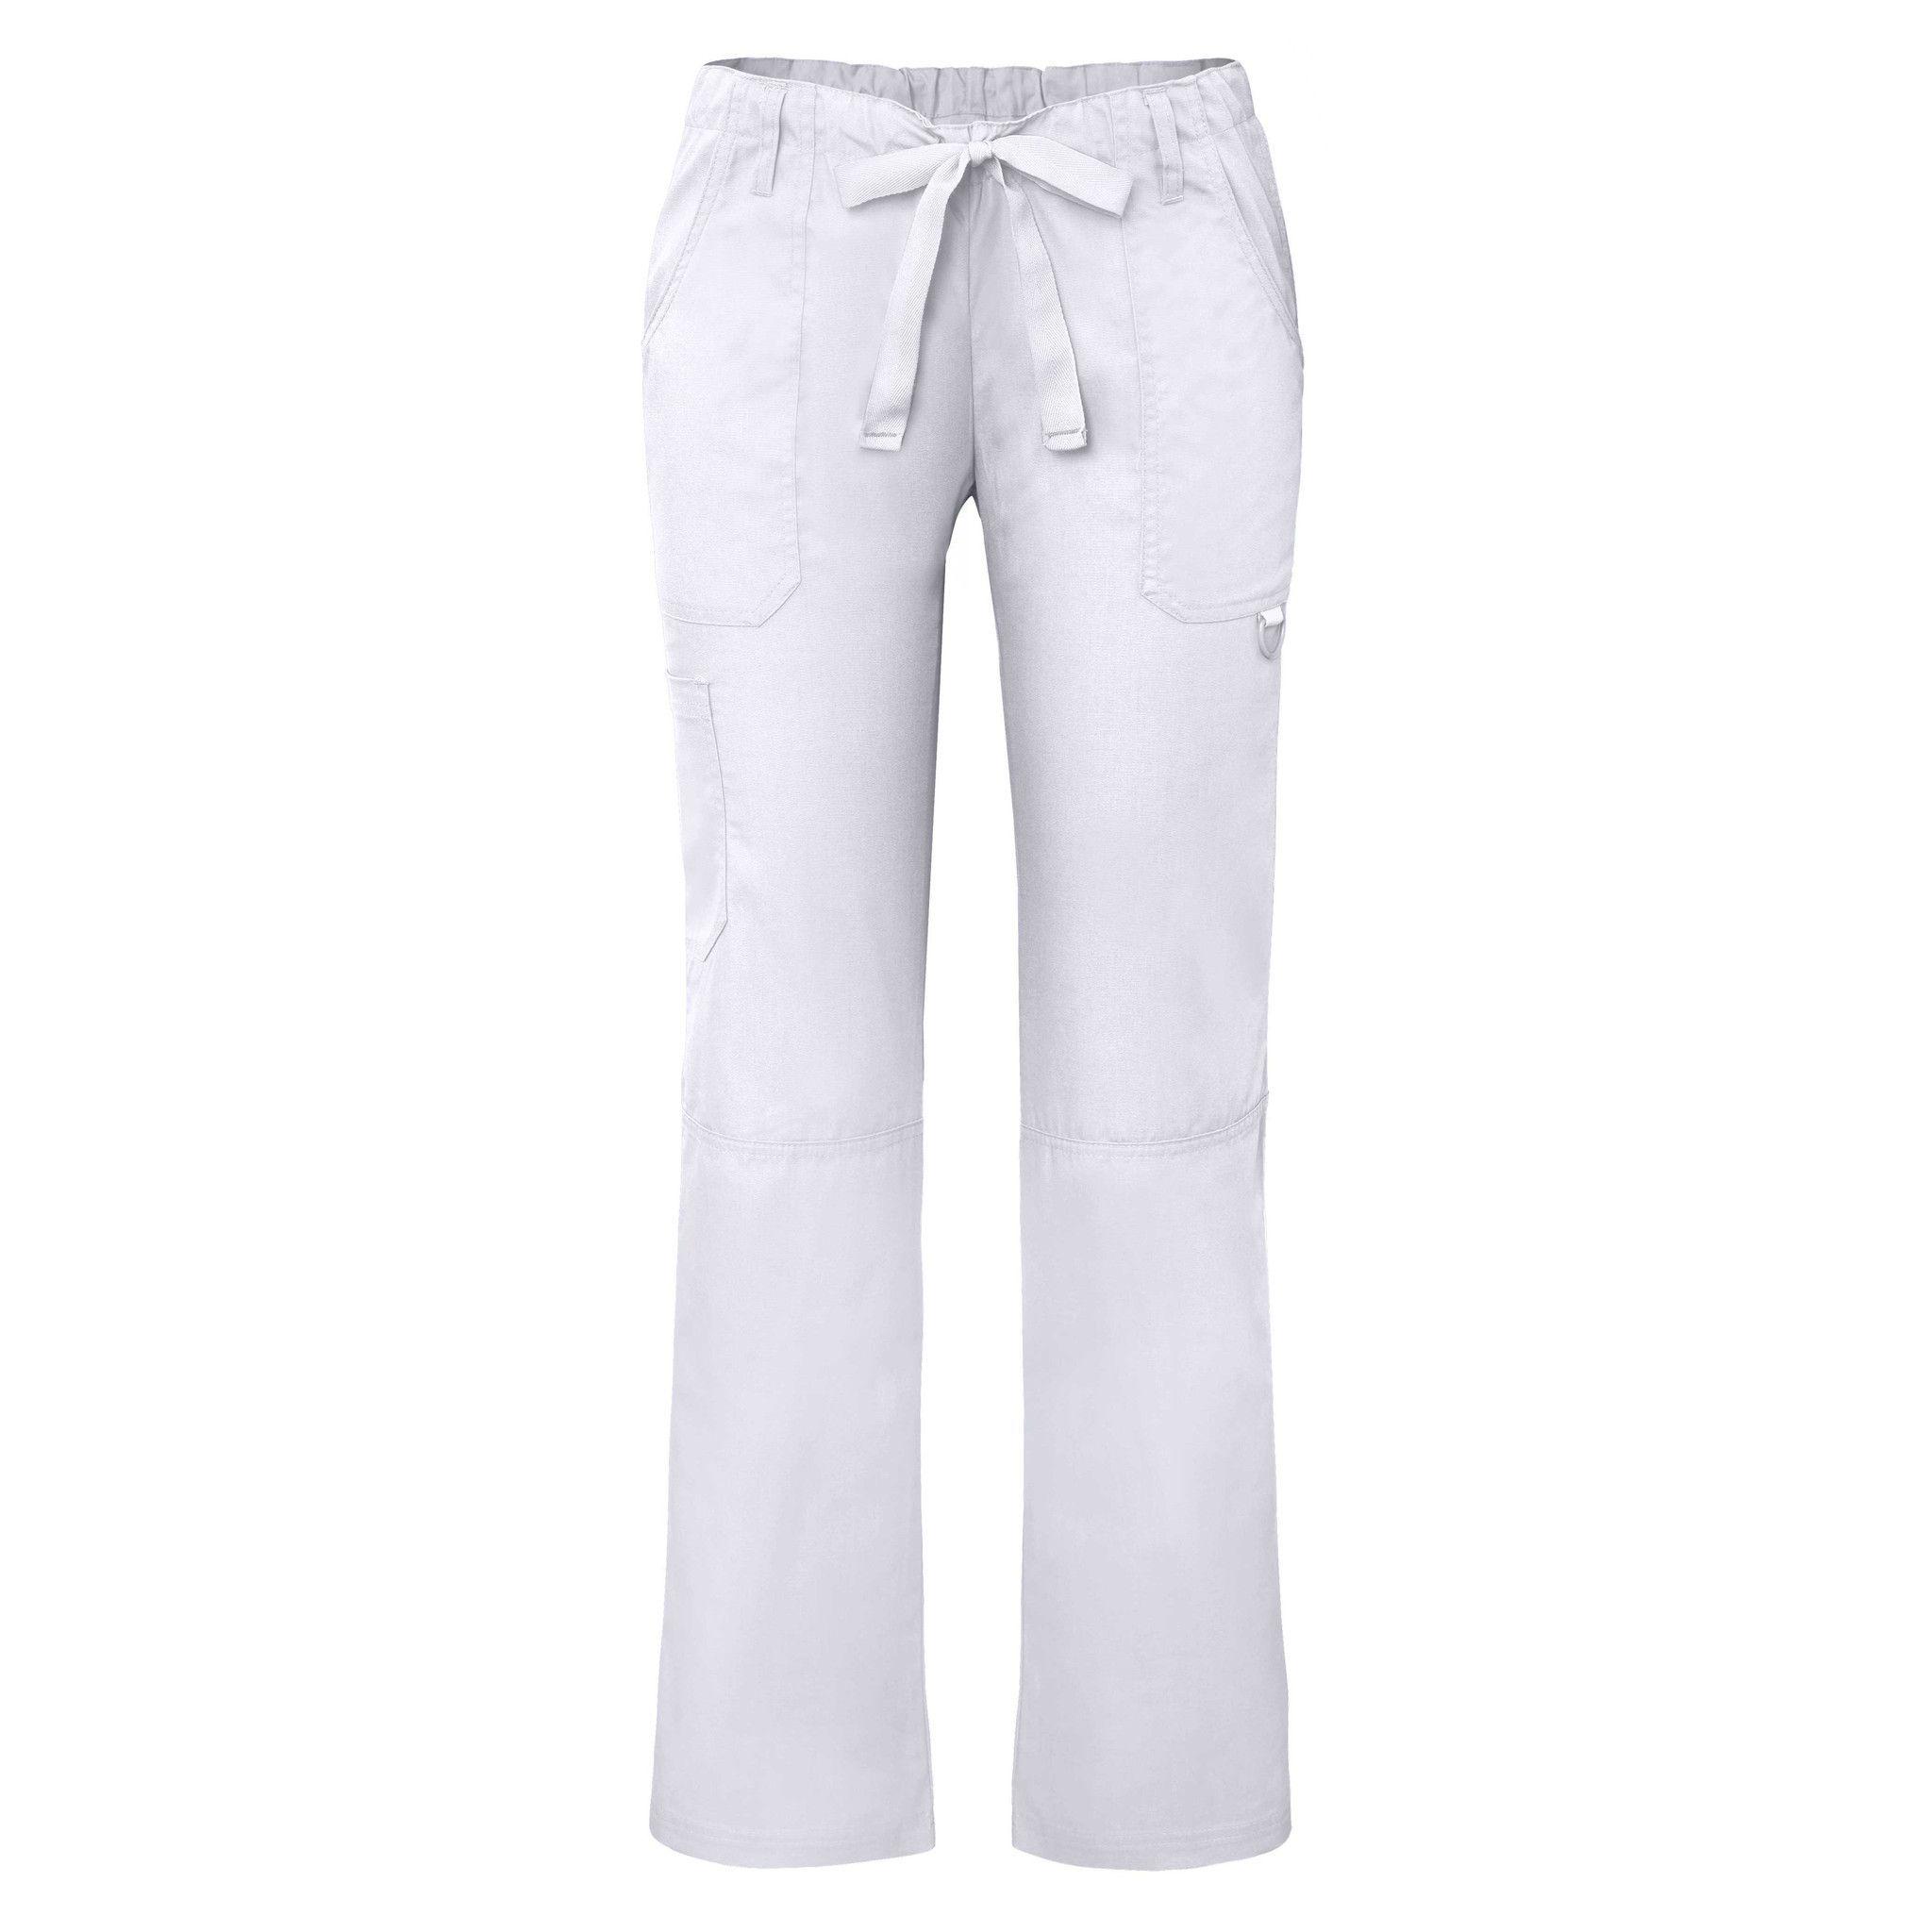 Adar Universal Low-Rise Multipocket Drawstring Straight Leg Pants Tall